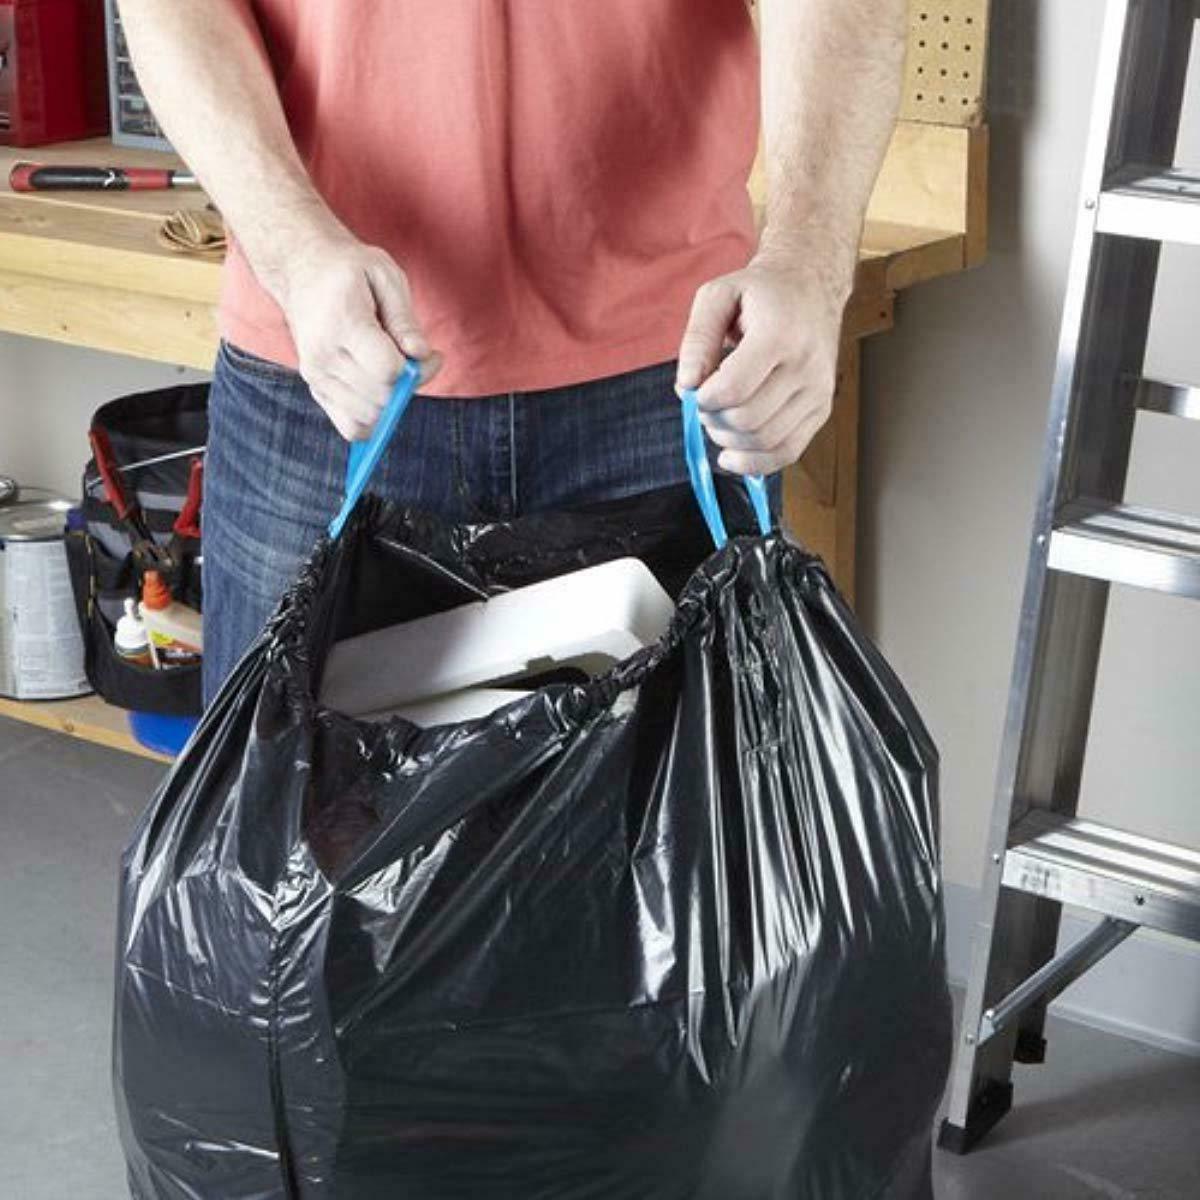 Duty Multipurpose Trash Can Liner Large Gallon